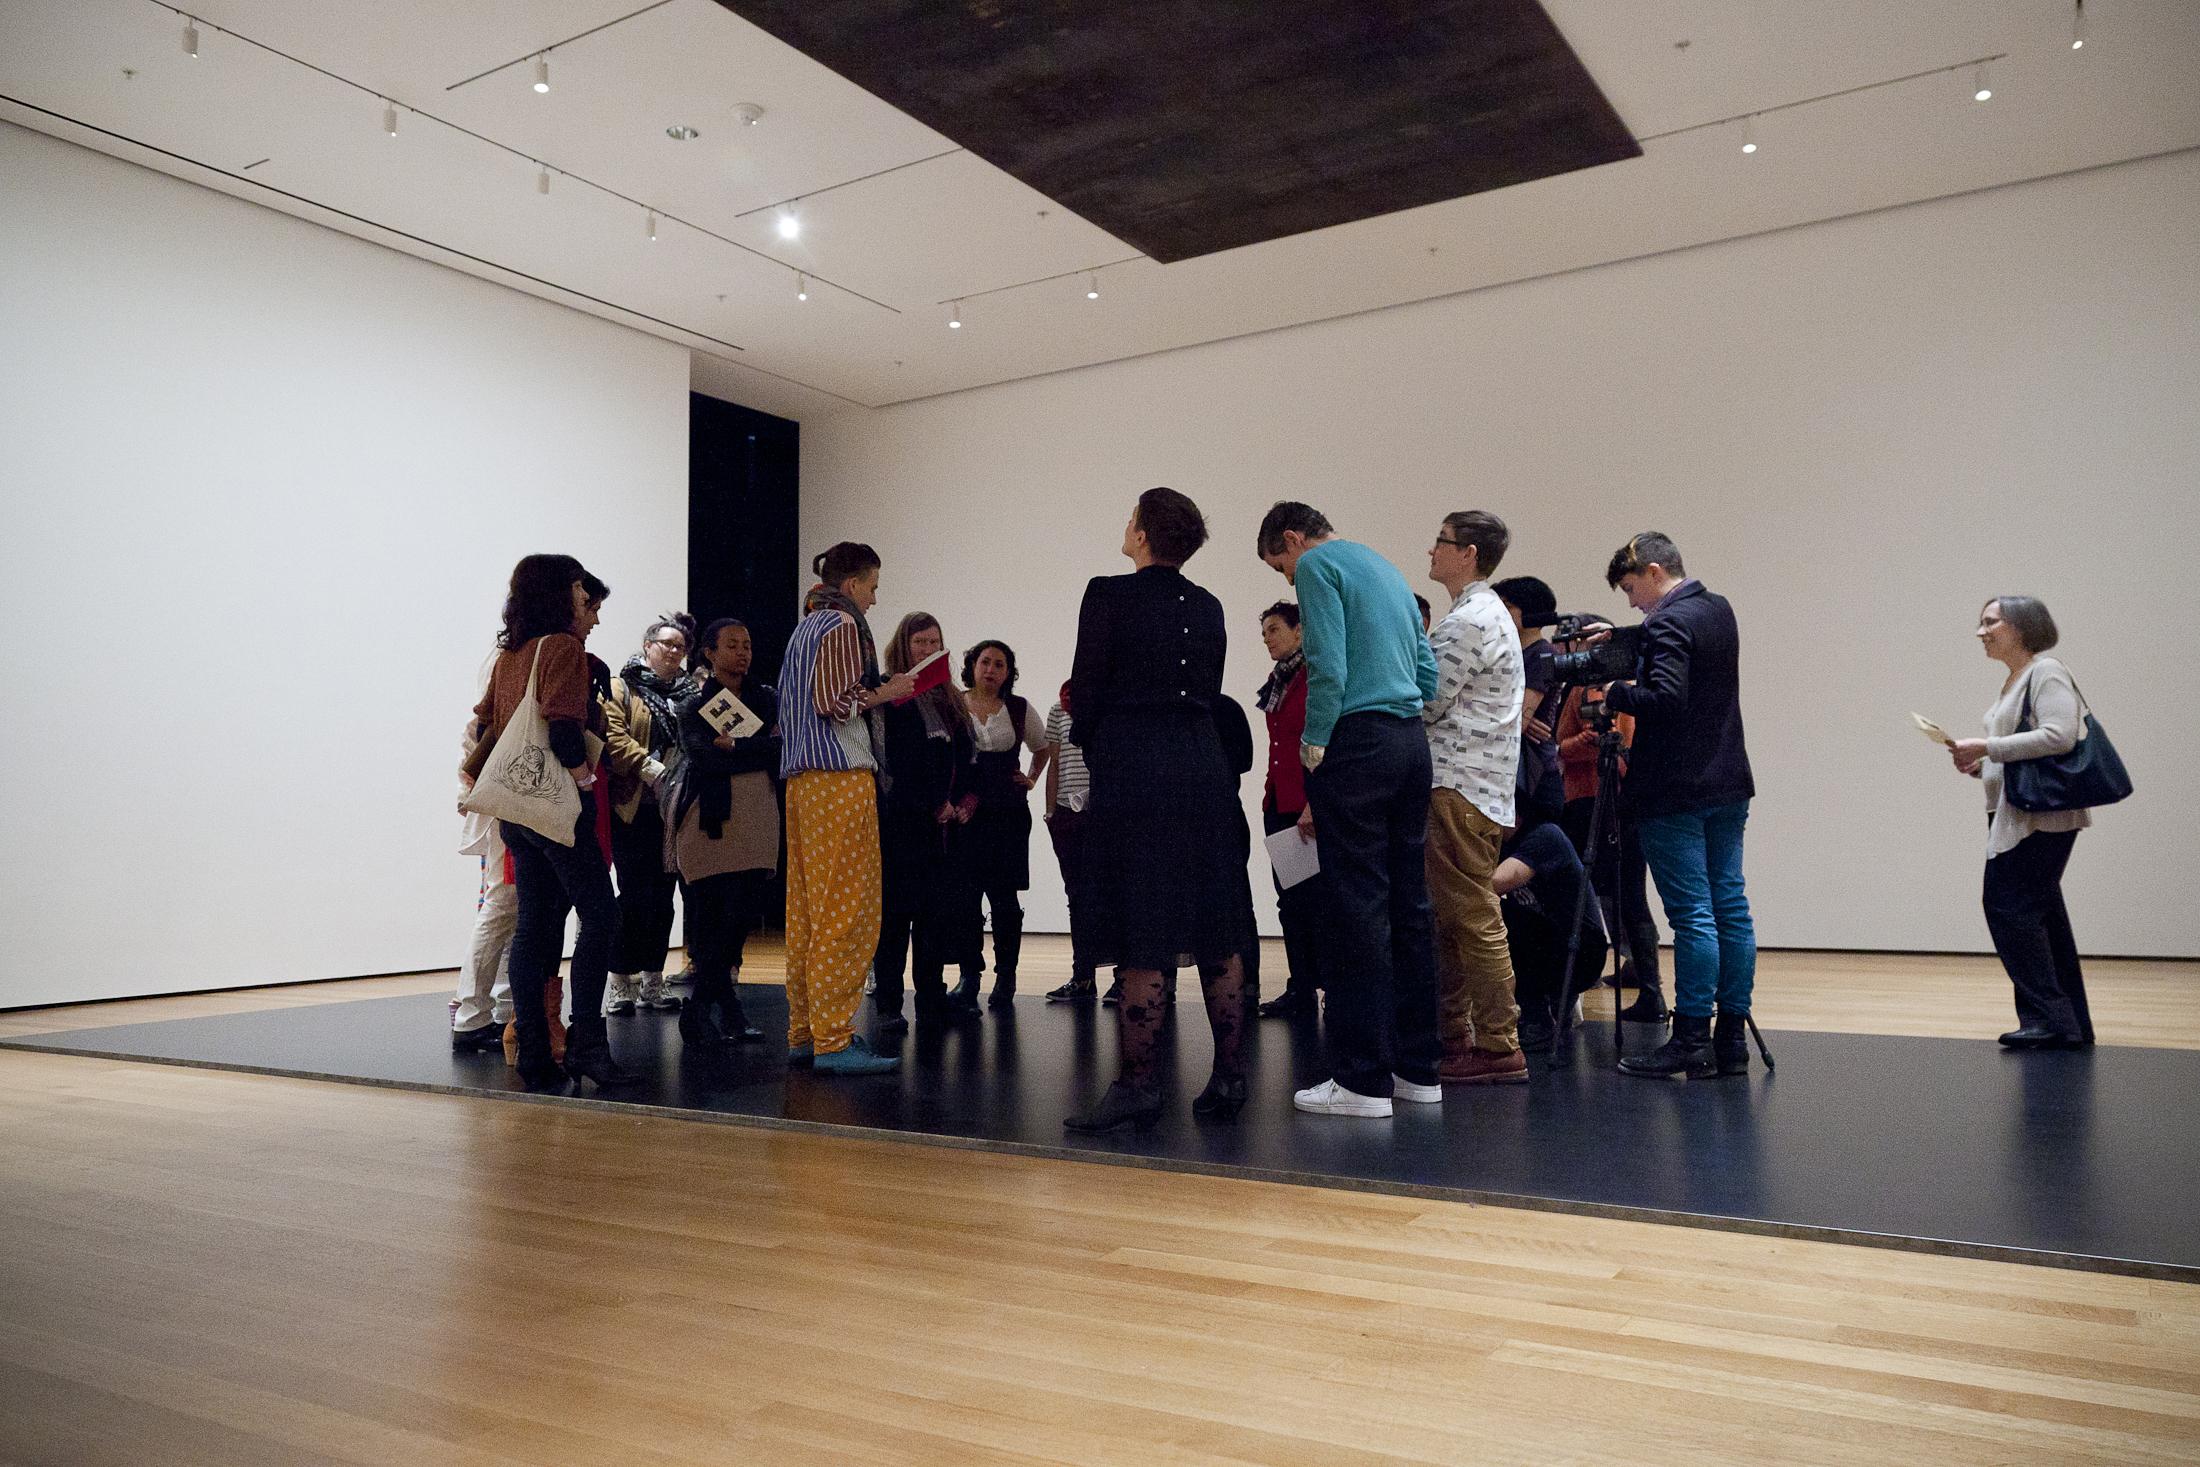 A.K. Burns reads Wittig and Bataille inside Richard Serra's Delineator